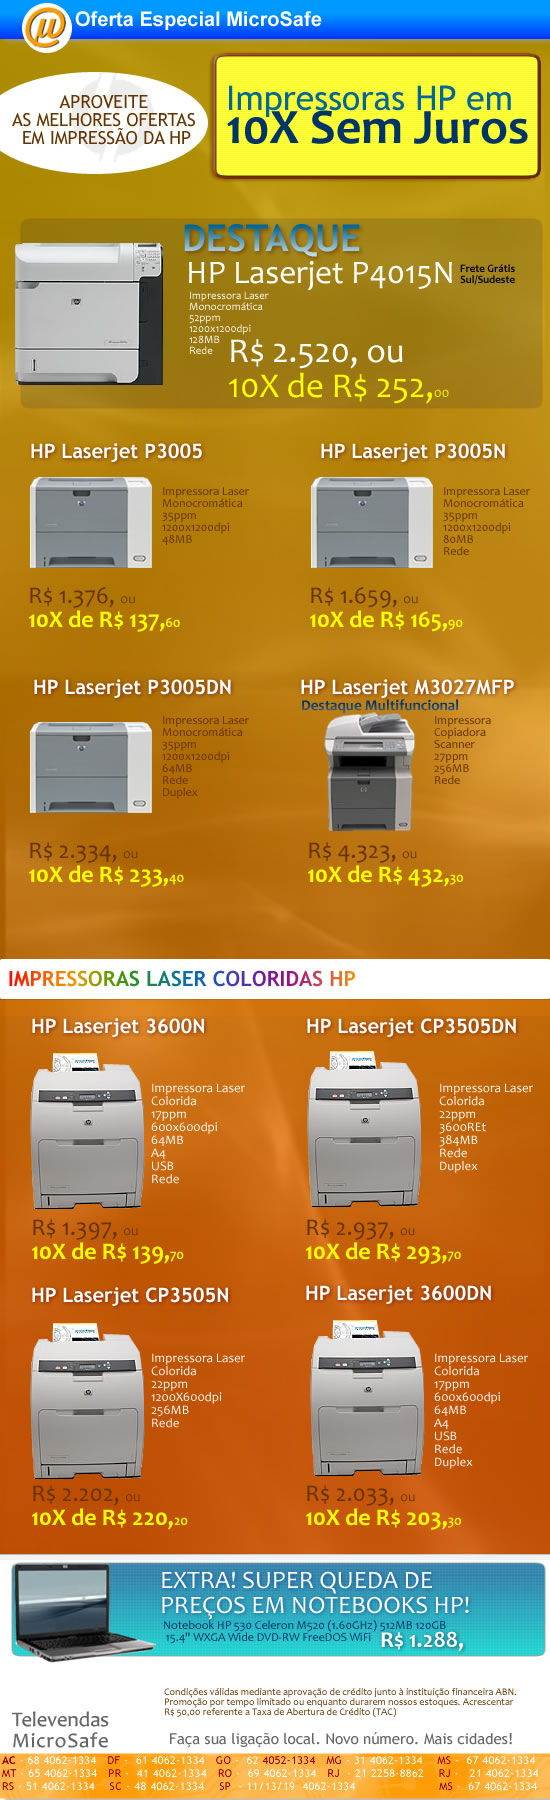 Impressoras HP na MicroSafe em 10X sem Juros